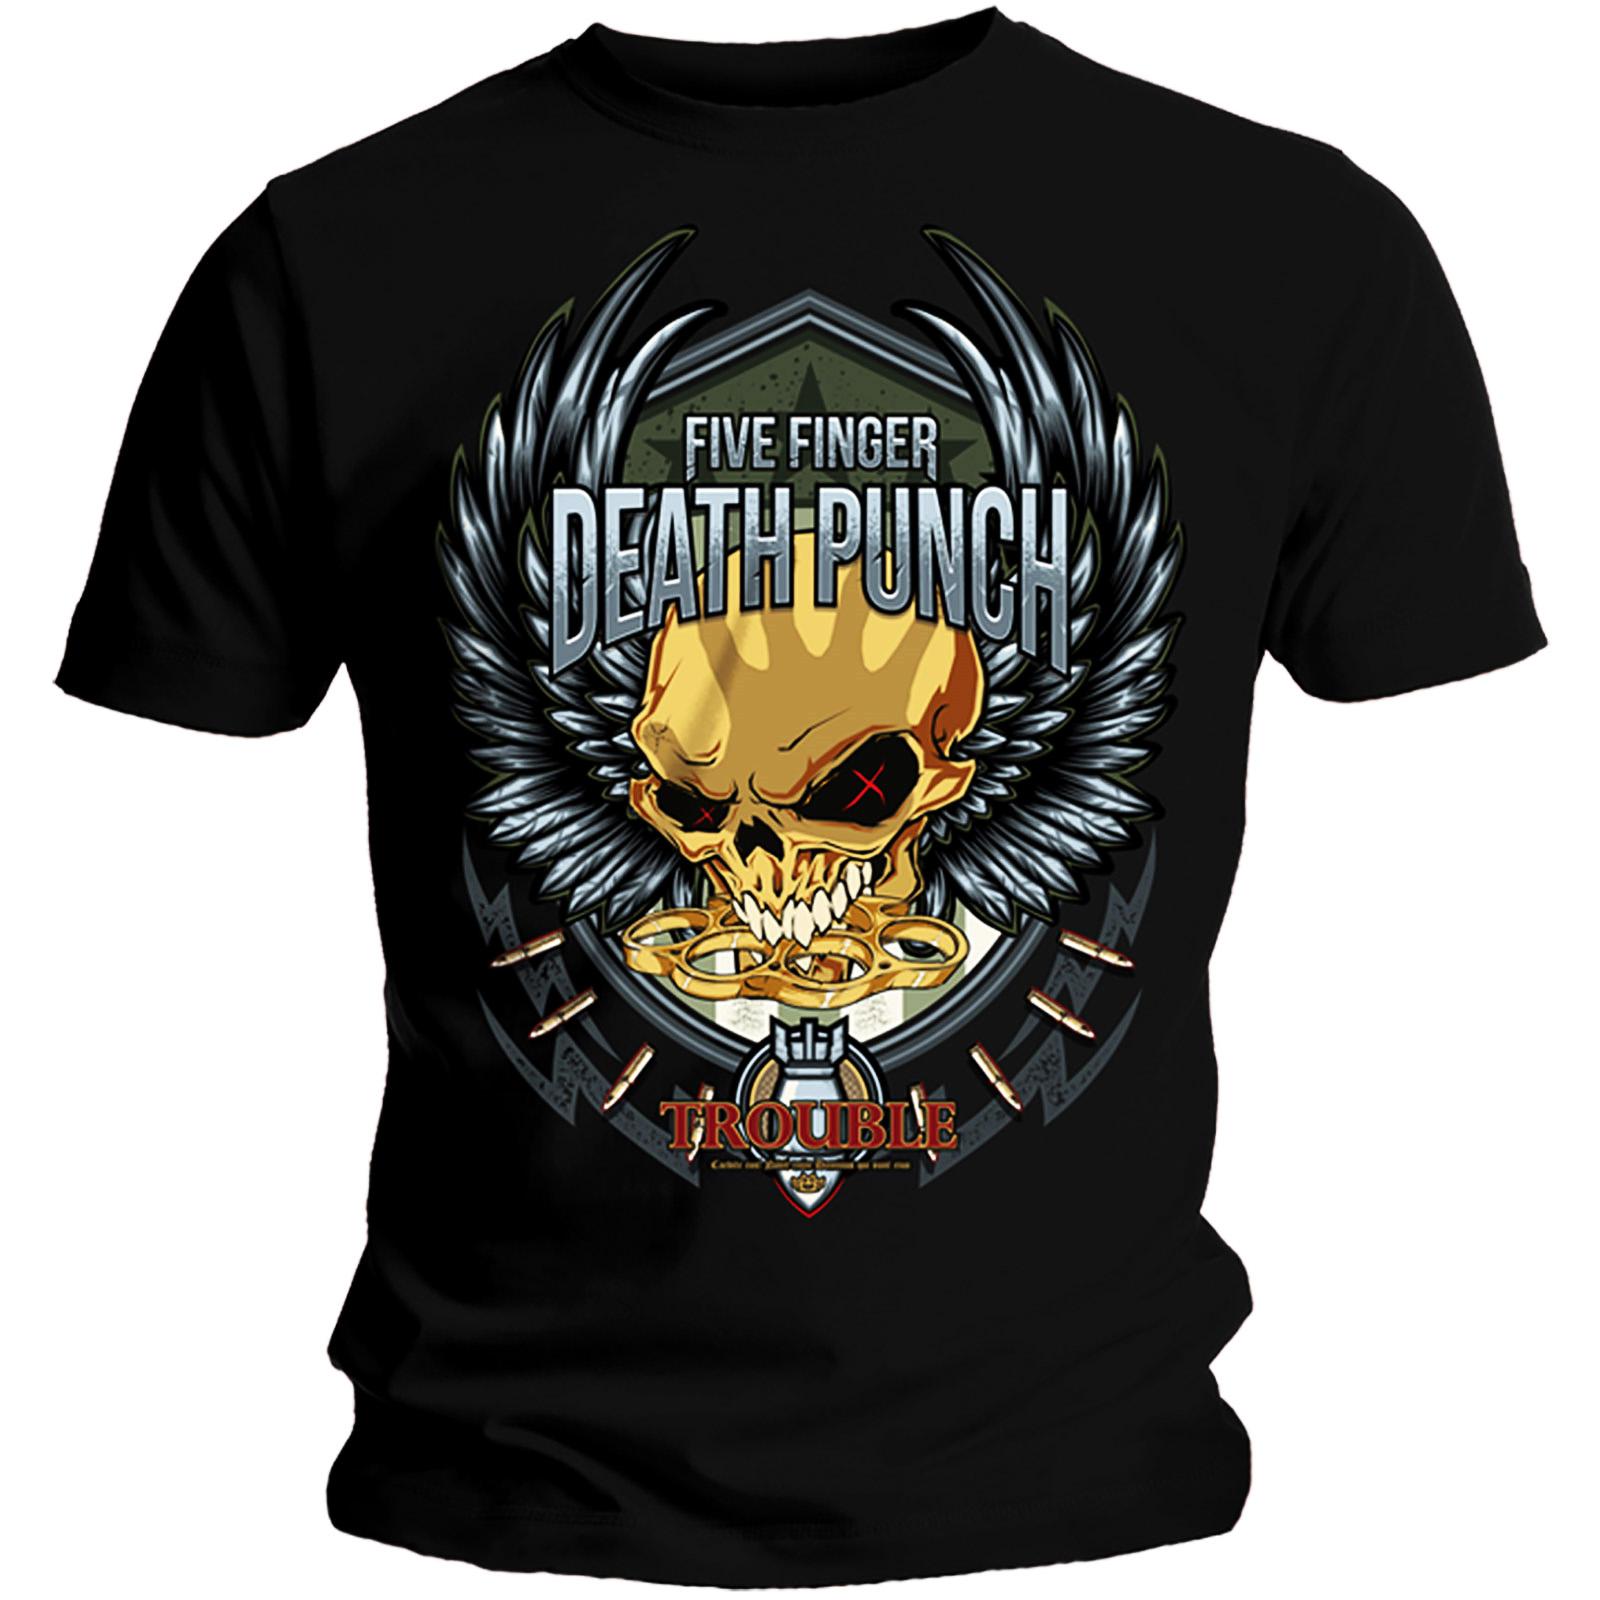 Official-T-Shirt-Five-Finger-Death-Punch-TROUBLE-Decade-of-Destruction-All-Sizes thumbnail 7